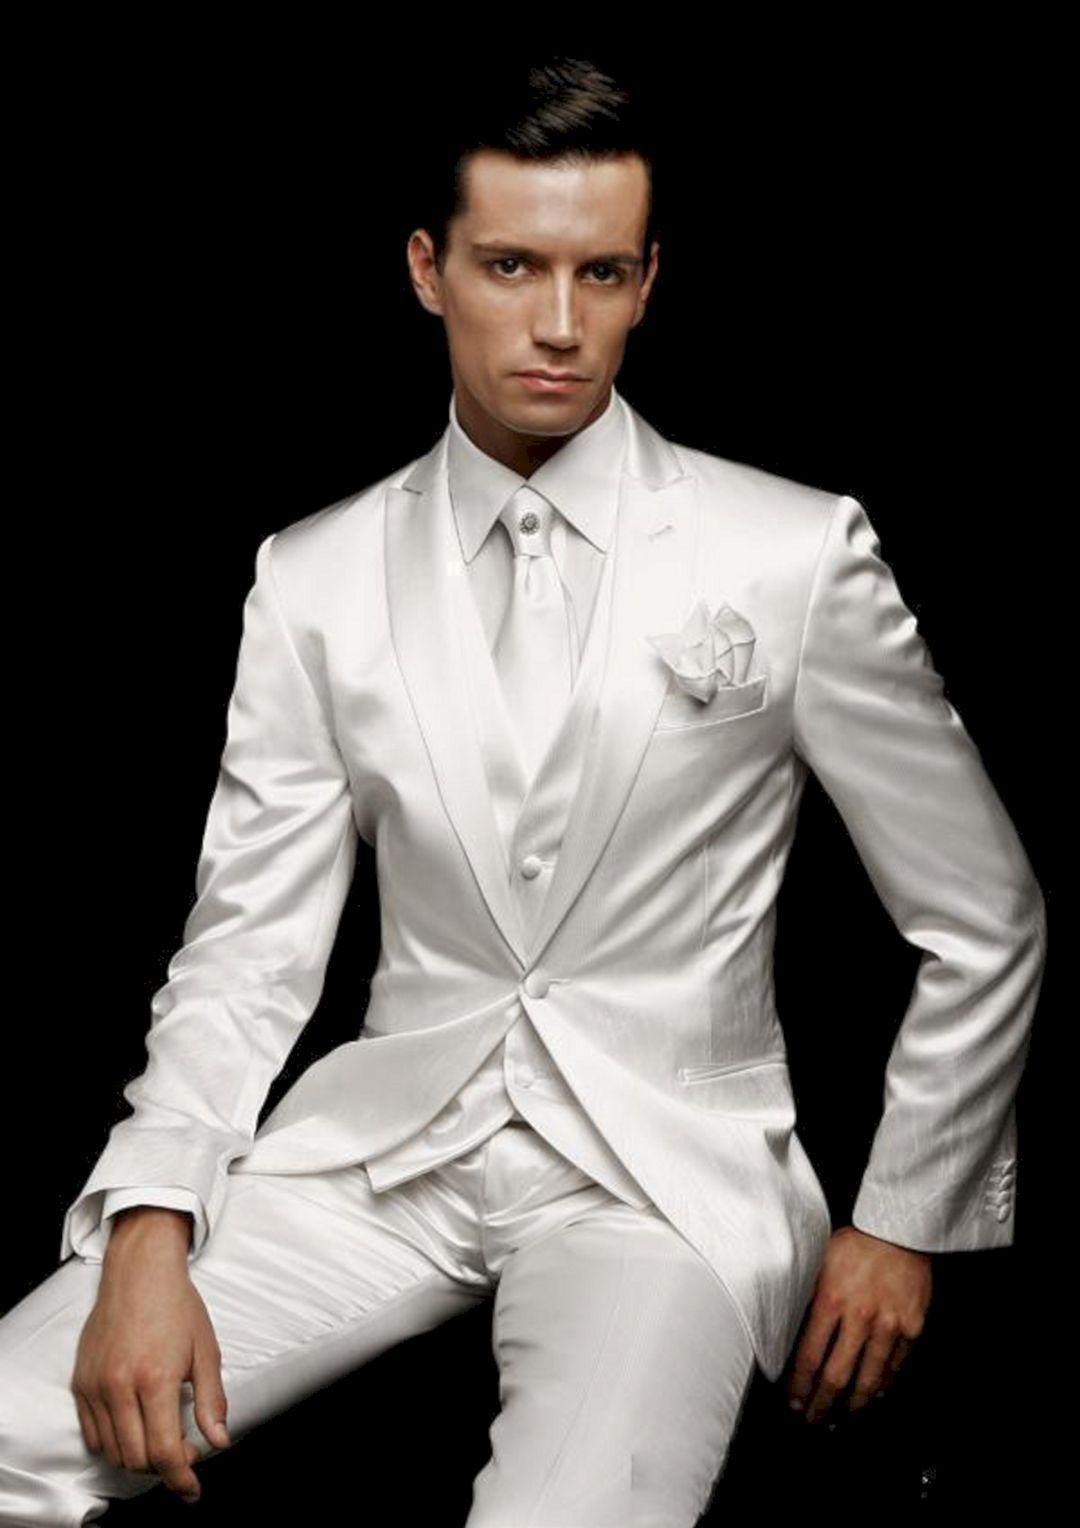 Custom Made Generous White and Gold Vest Tie Groom Tuxedos ...